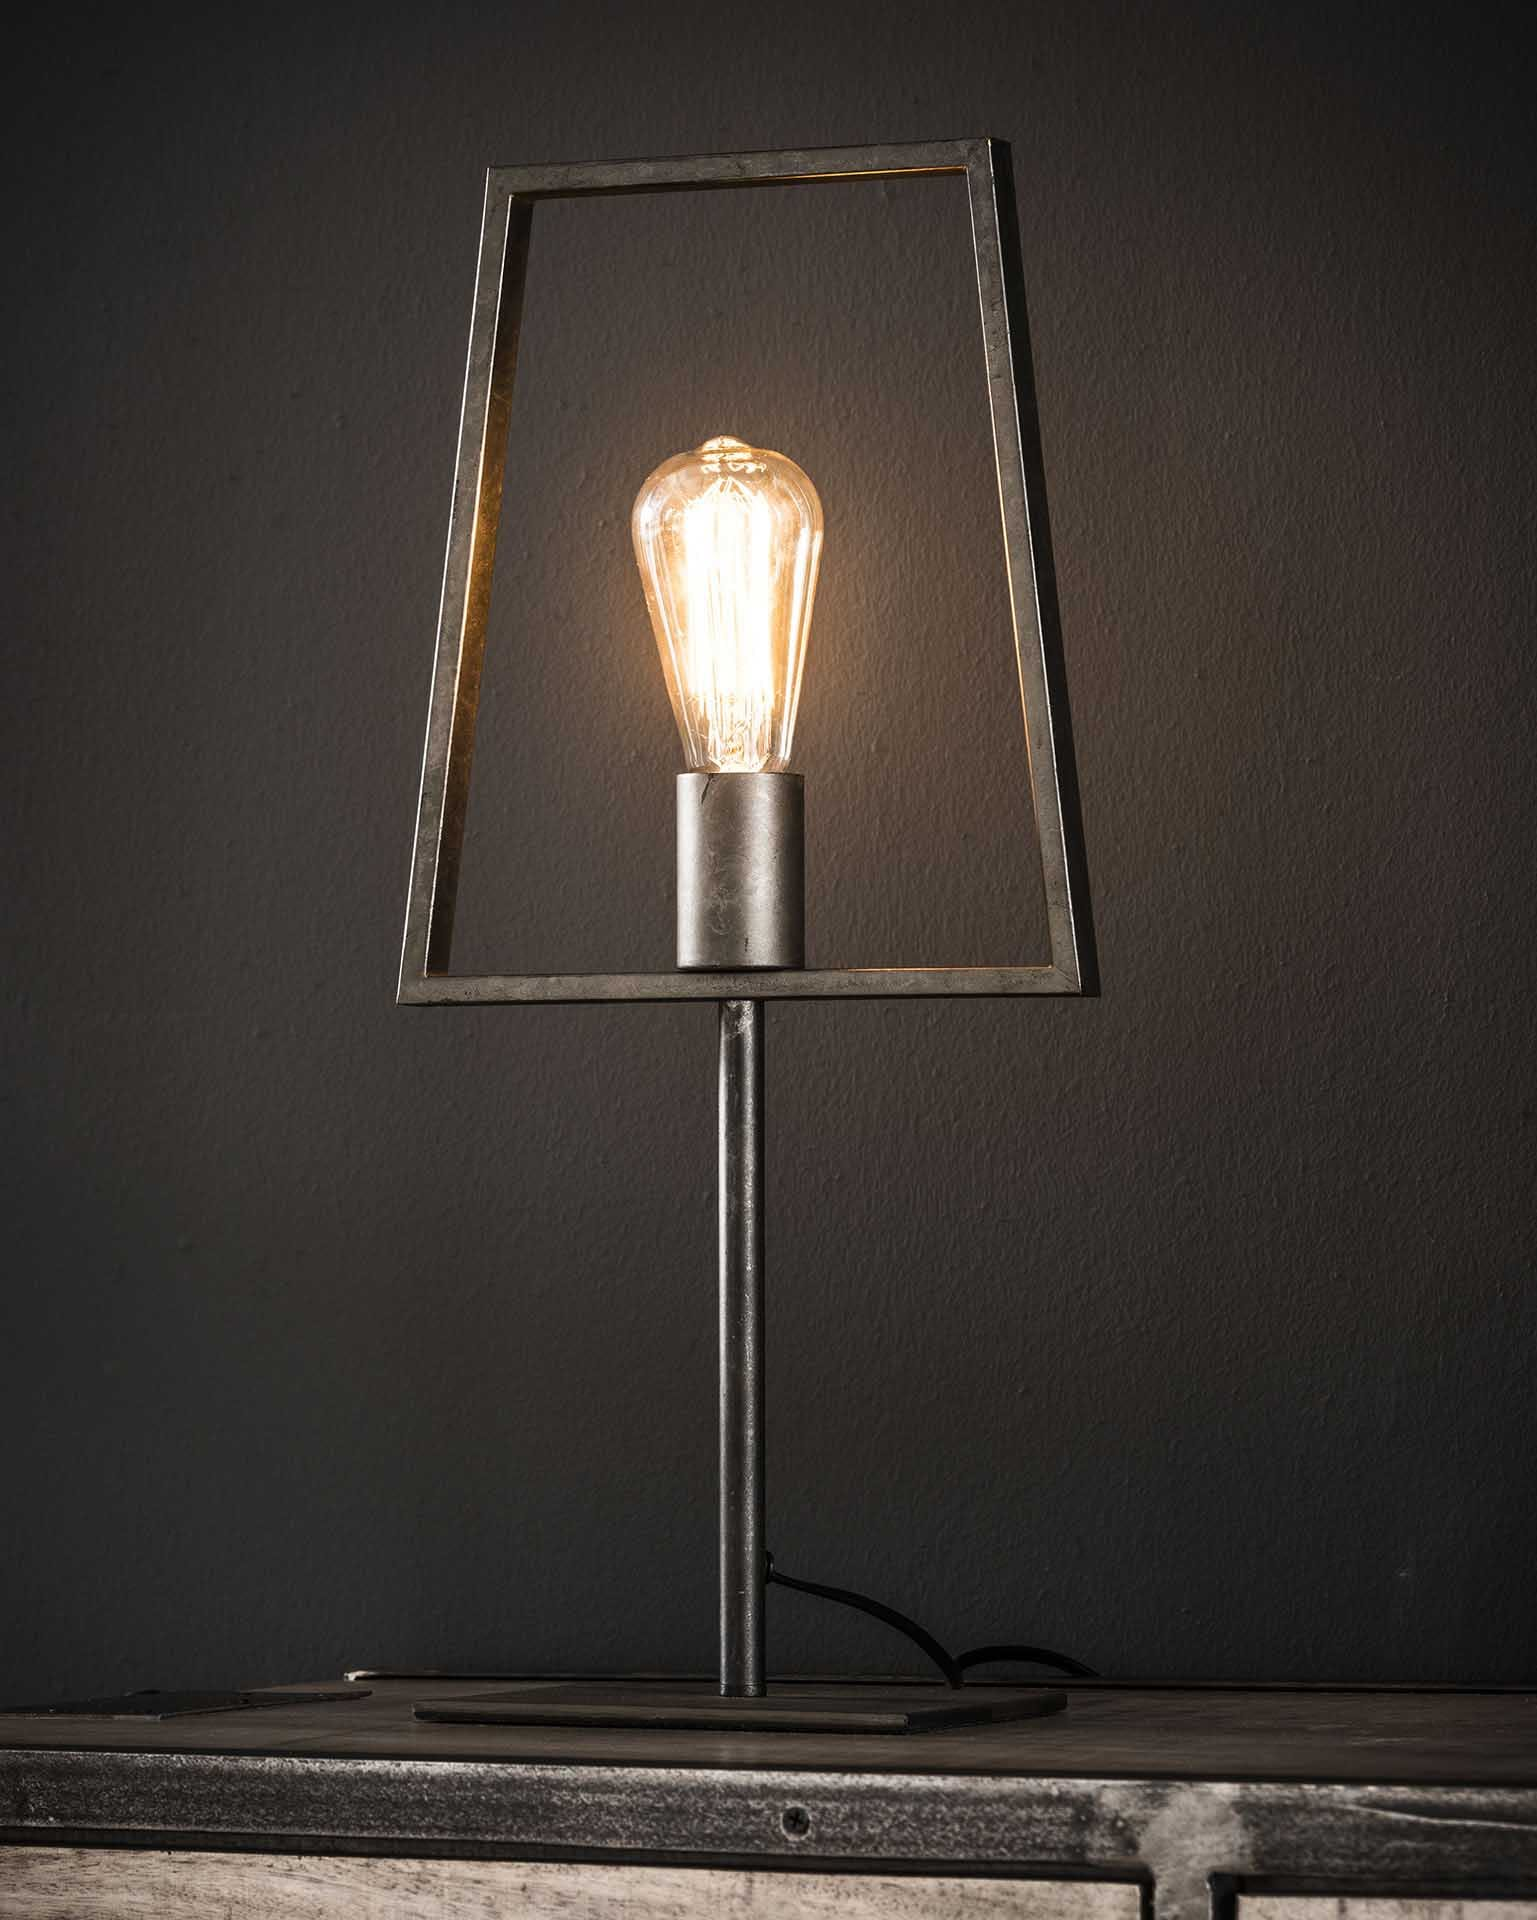 Lampe à poser design gris métal H52 cm RALF